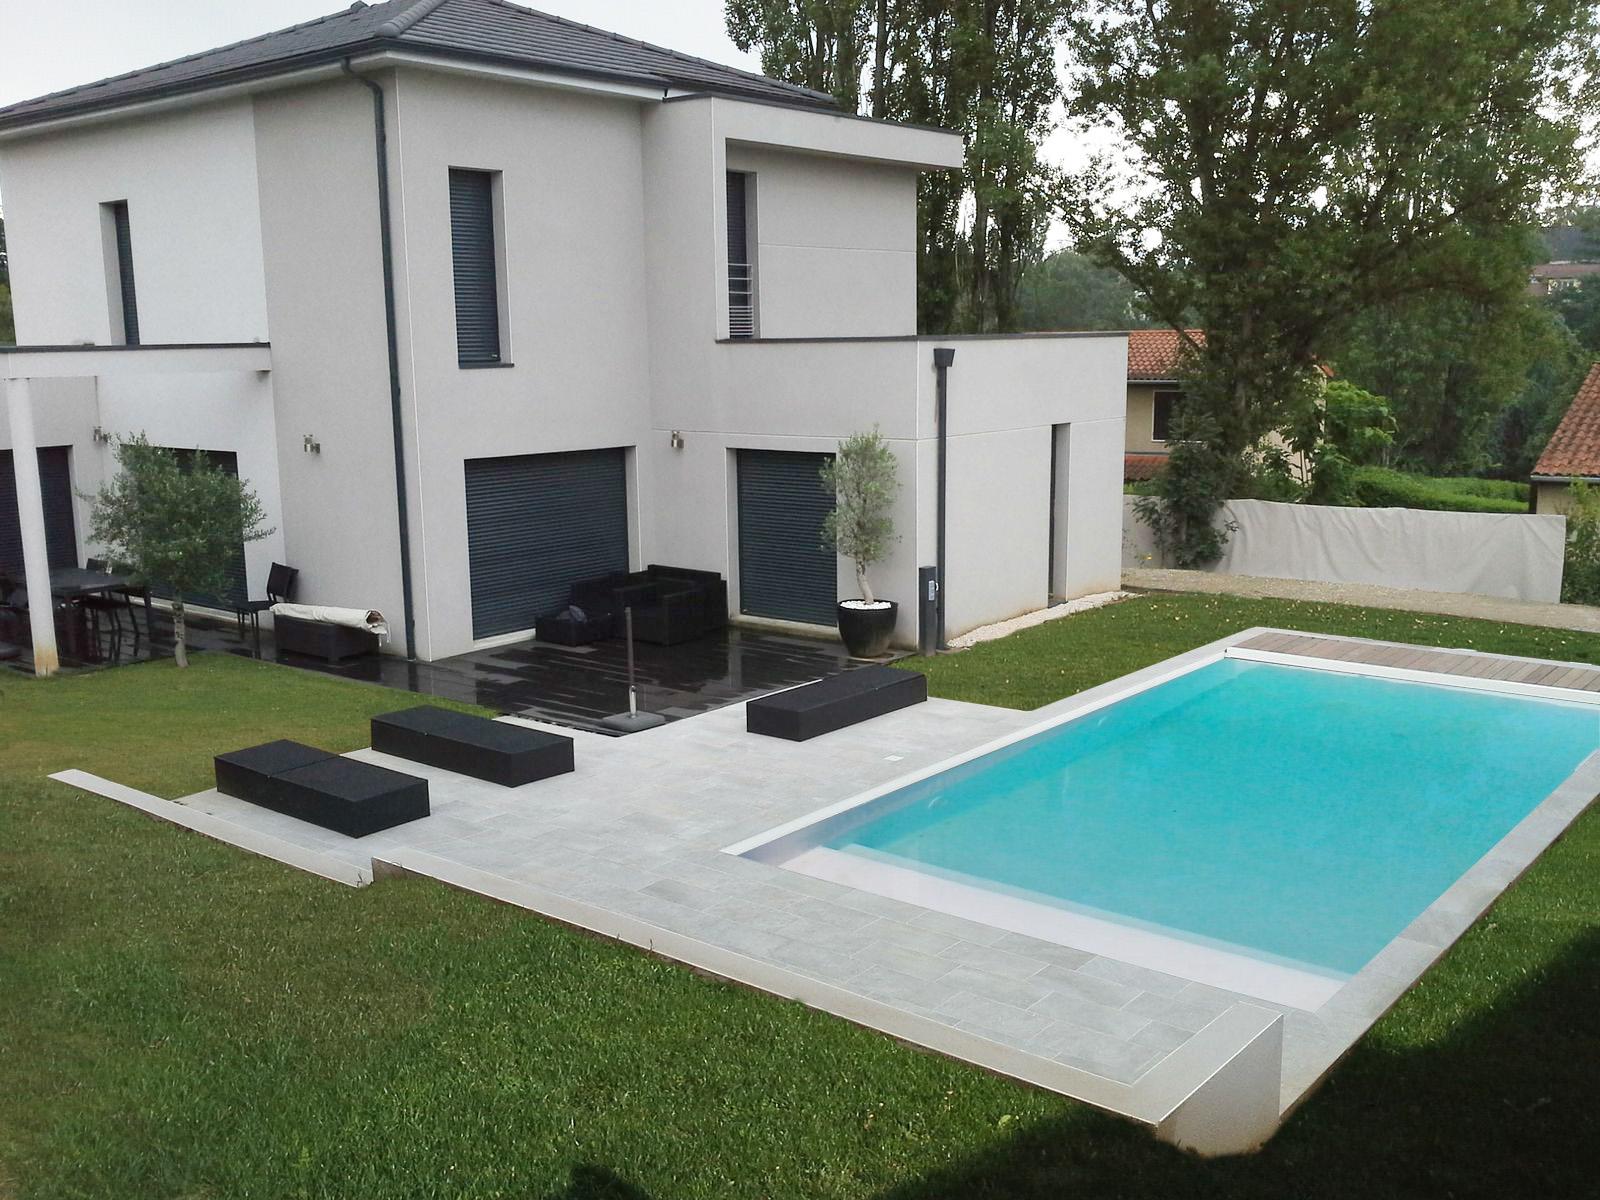 amenagement piscine contemporaine. Black Bedroom Furniture Sets. Home Design Ideas